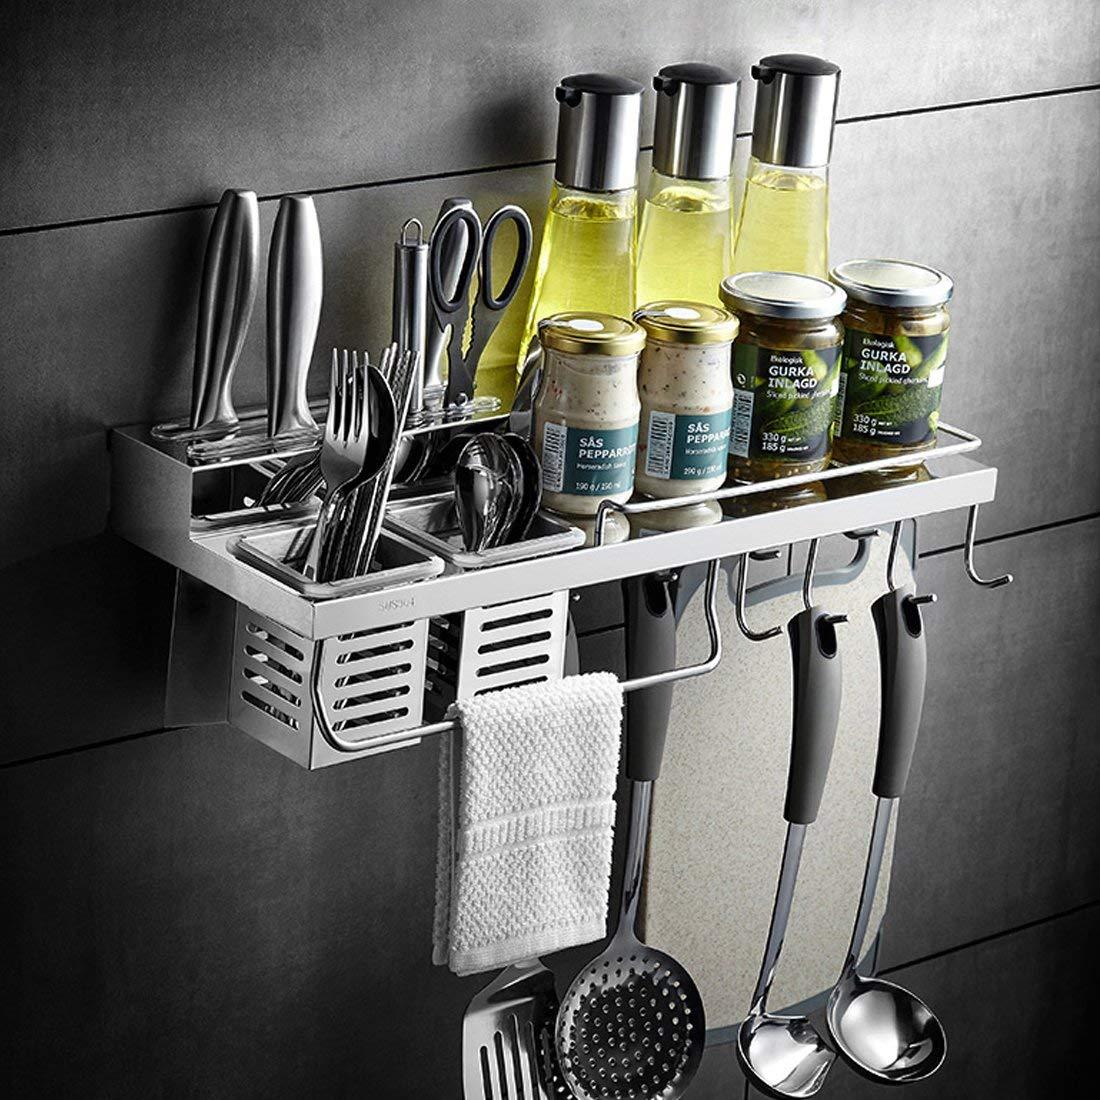 Wall Mounted Kitchen Cabinet Organizer Storage Stand Holder Shelf For Knife, Slice, Spoon, Duster Cloth, Cutting Board, Cruet